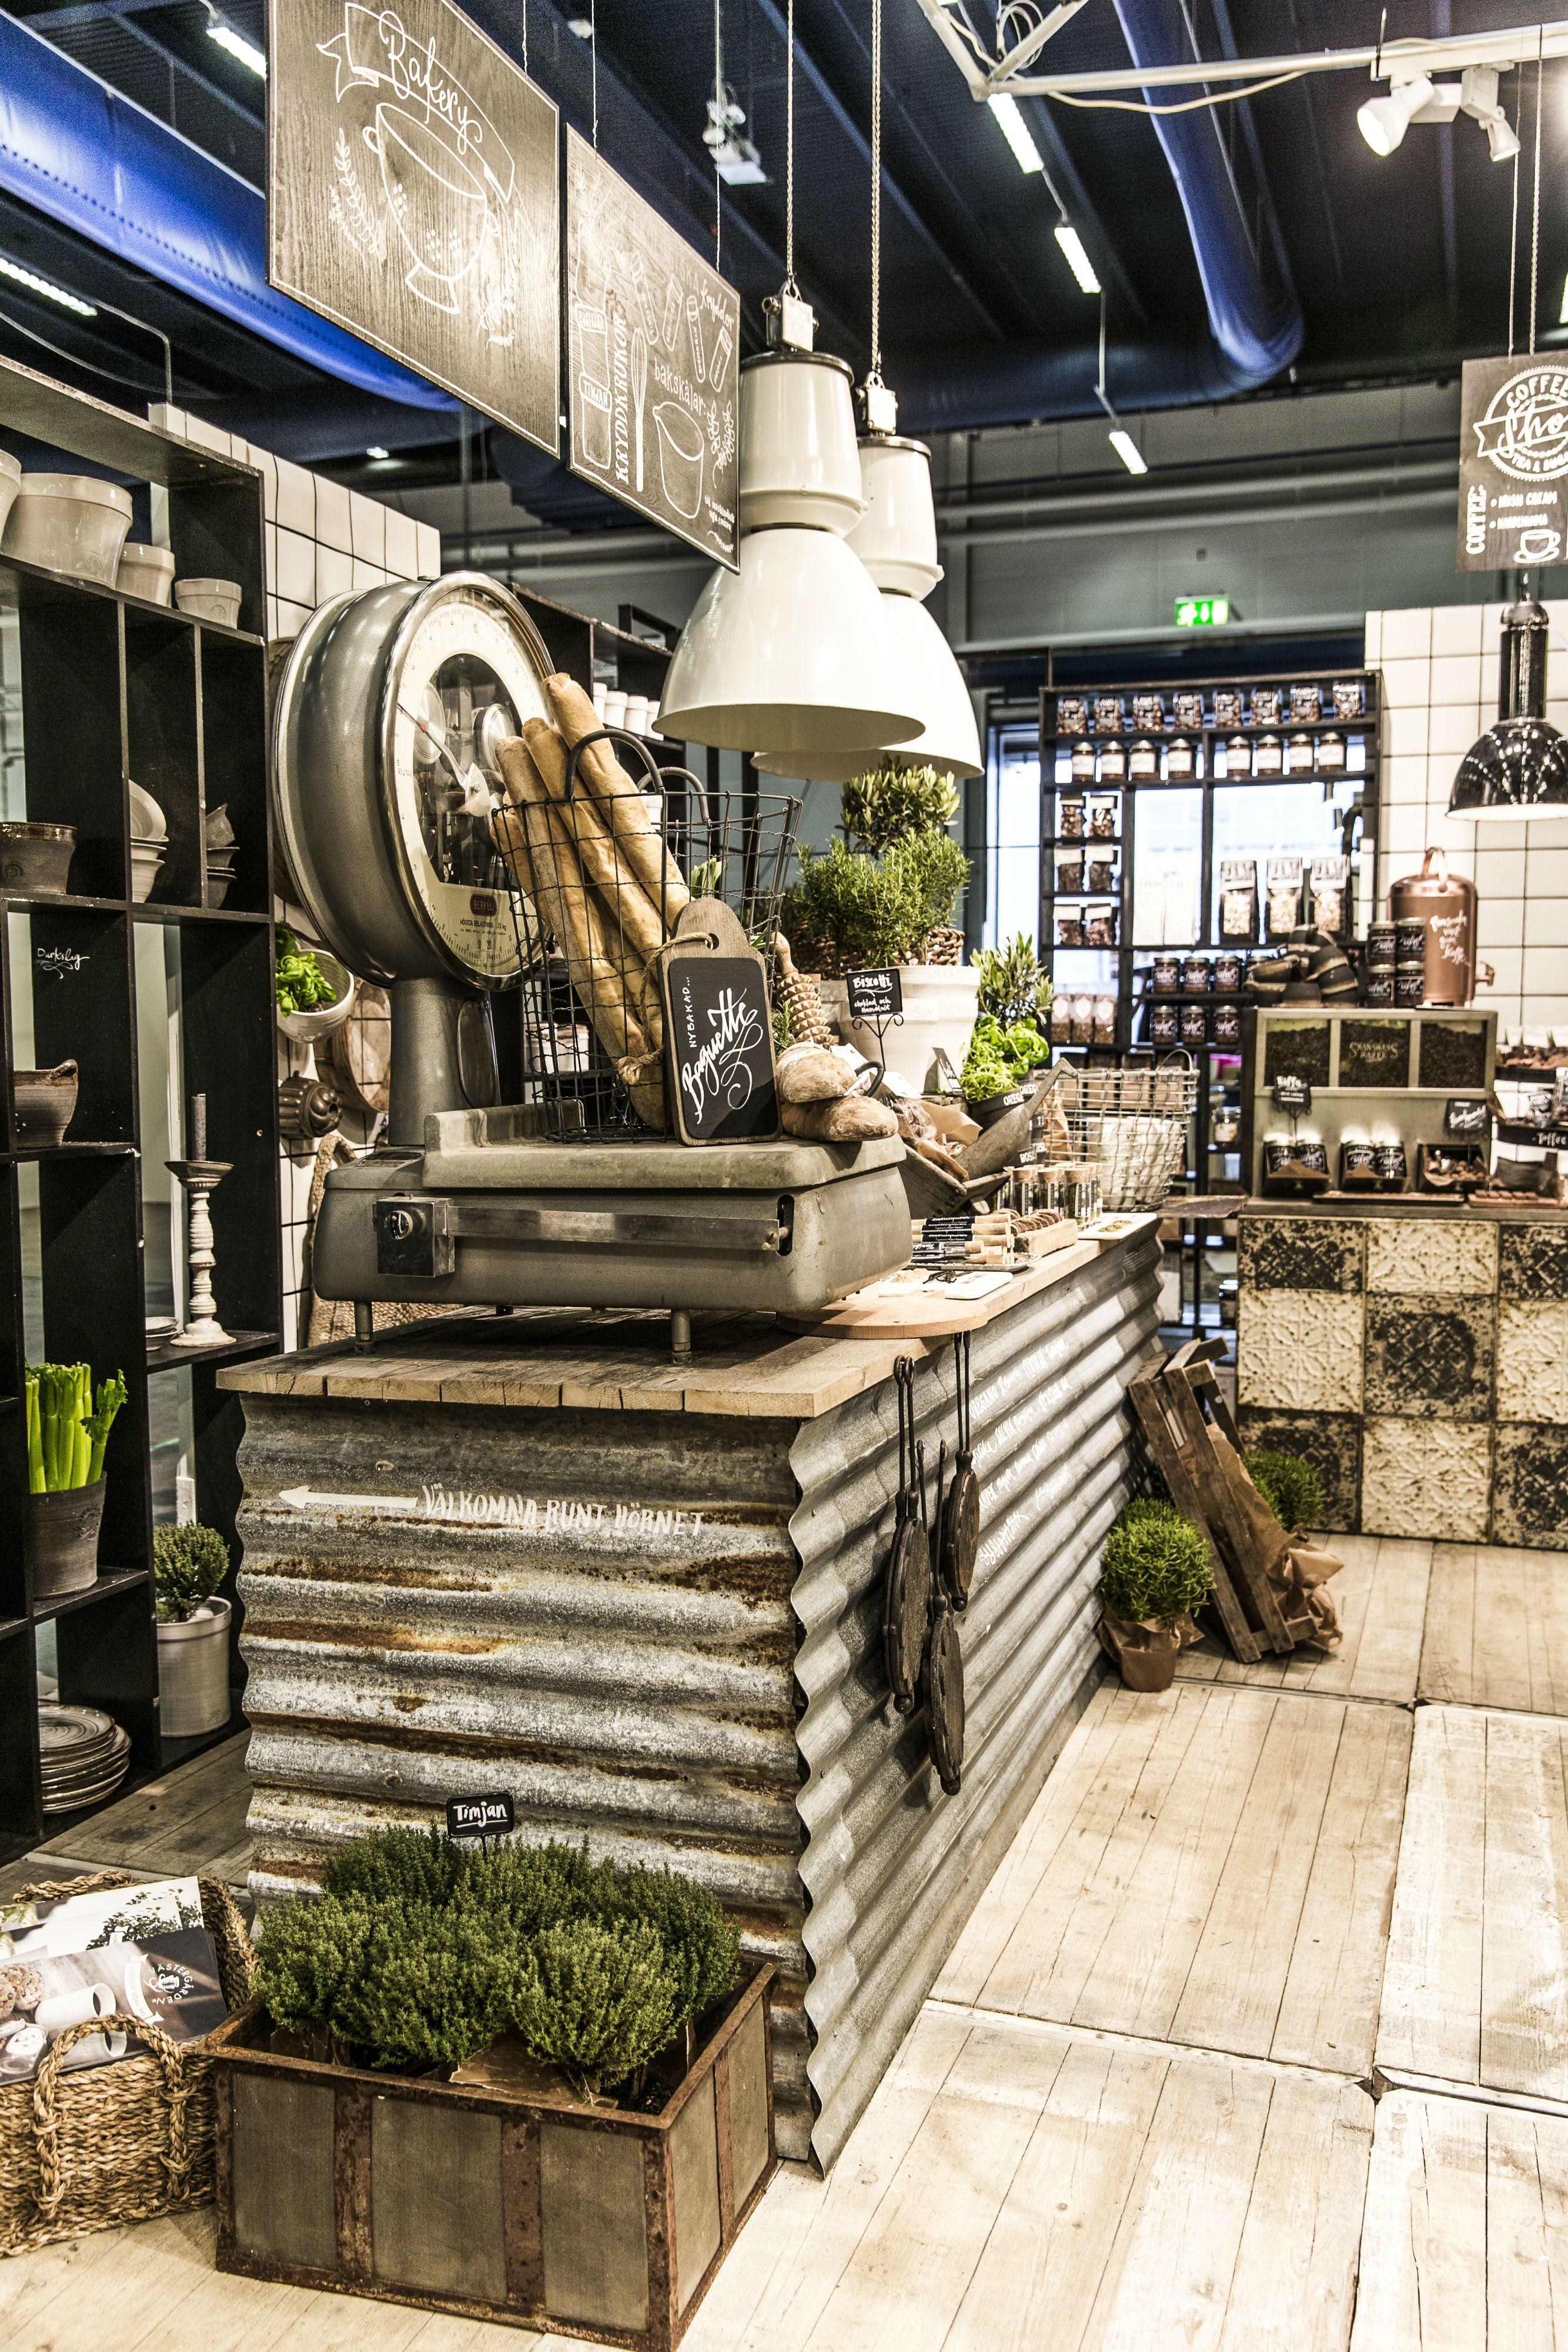 Montrar V277 Cafe I 2019 Industriell Inredning Bageri